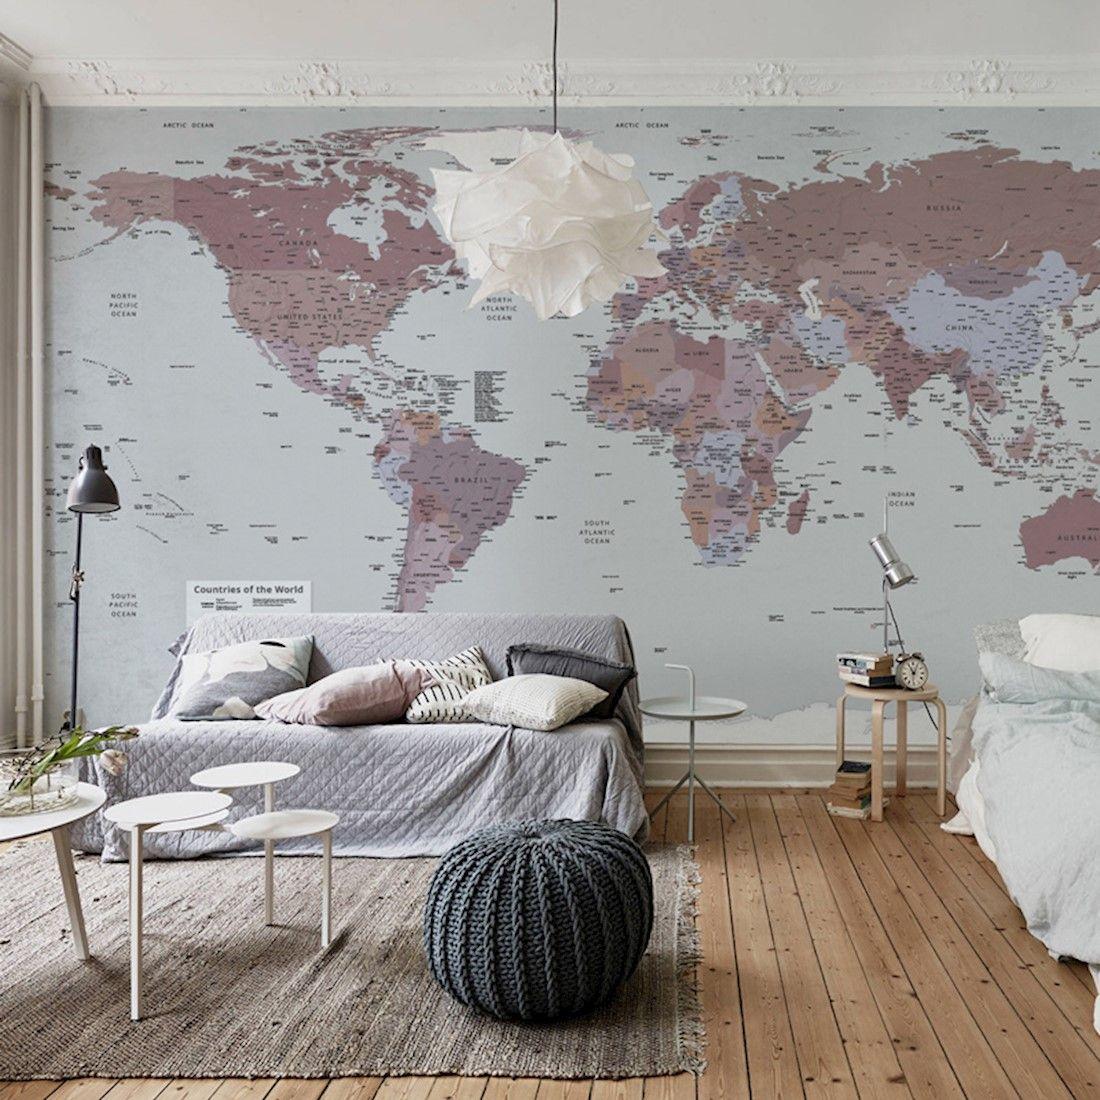 Mural De Parede Mapa Mundi Rosa Murais De Parede Papel De Parede Mapa Mundi Casa E Lar